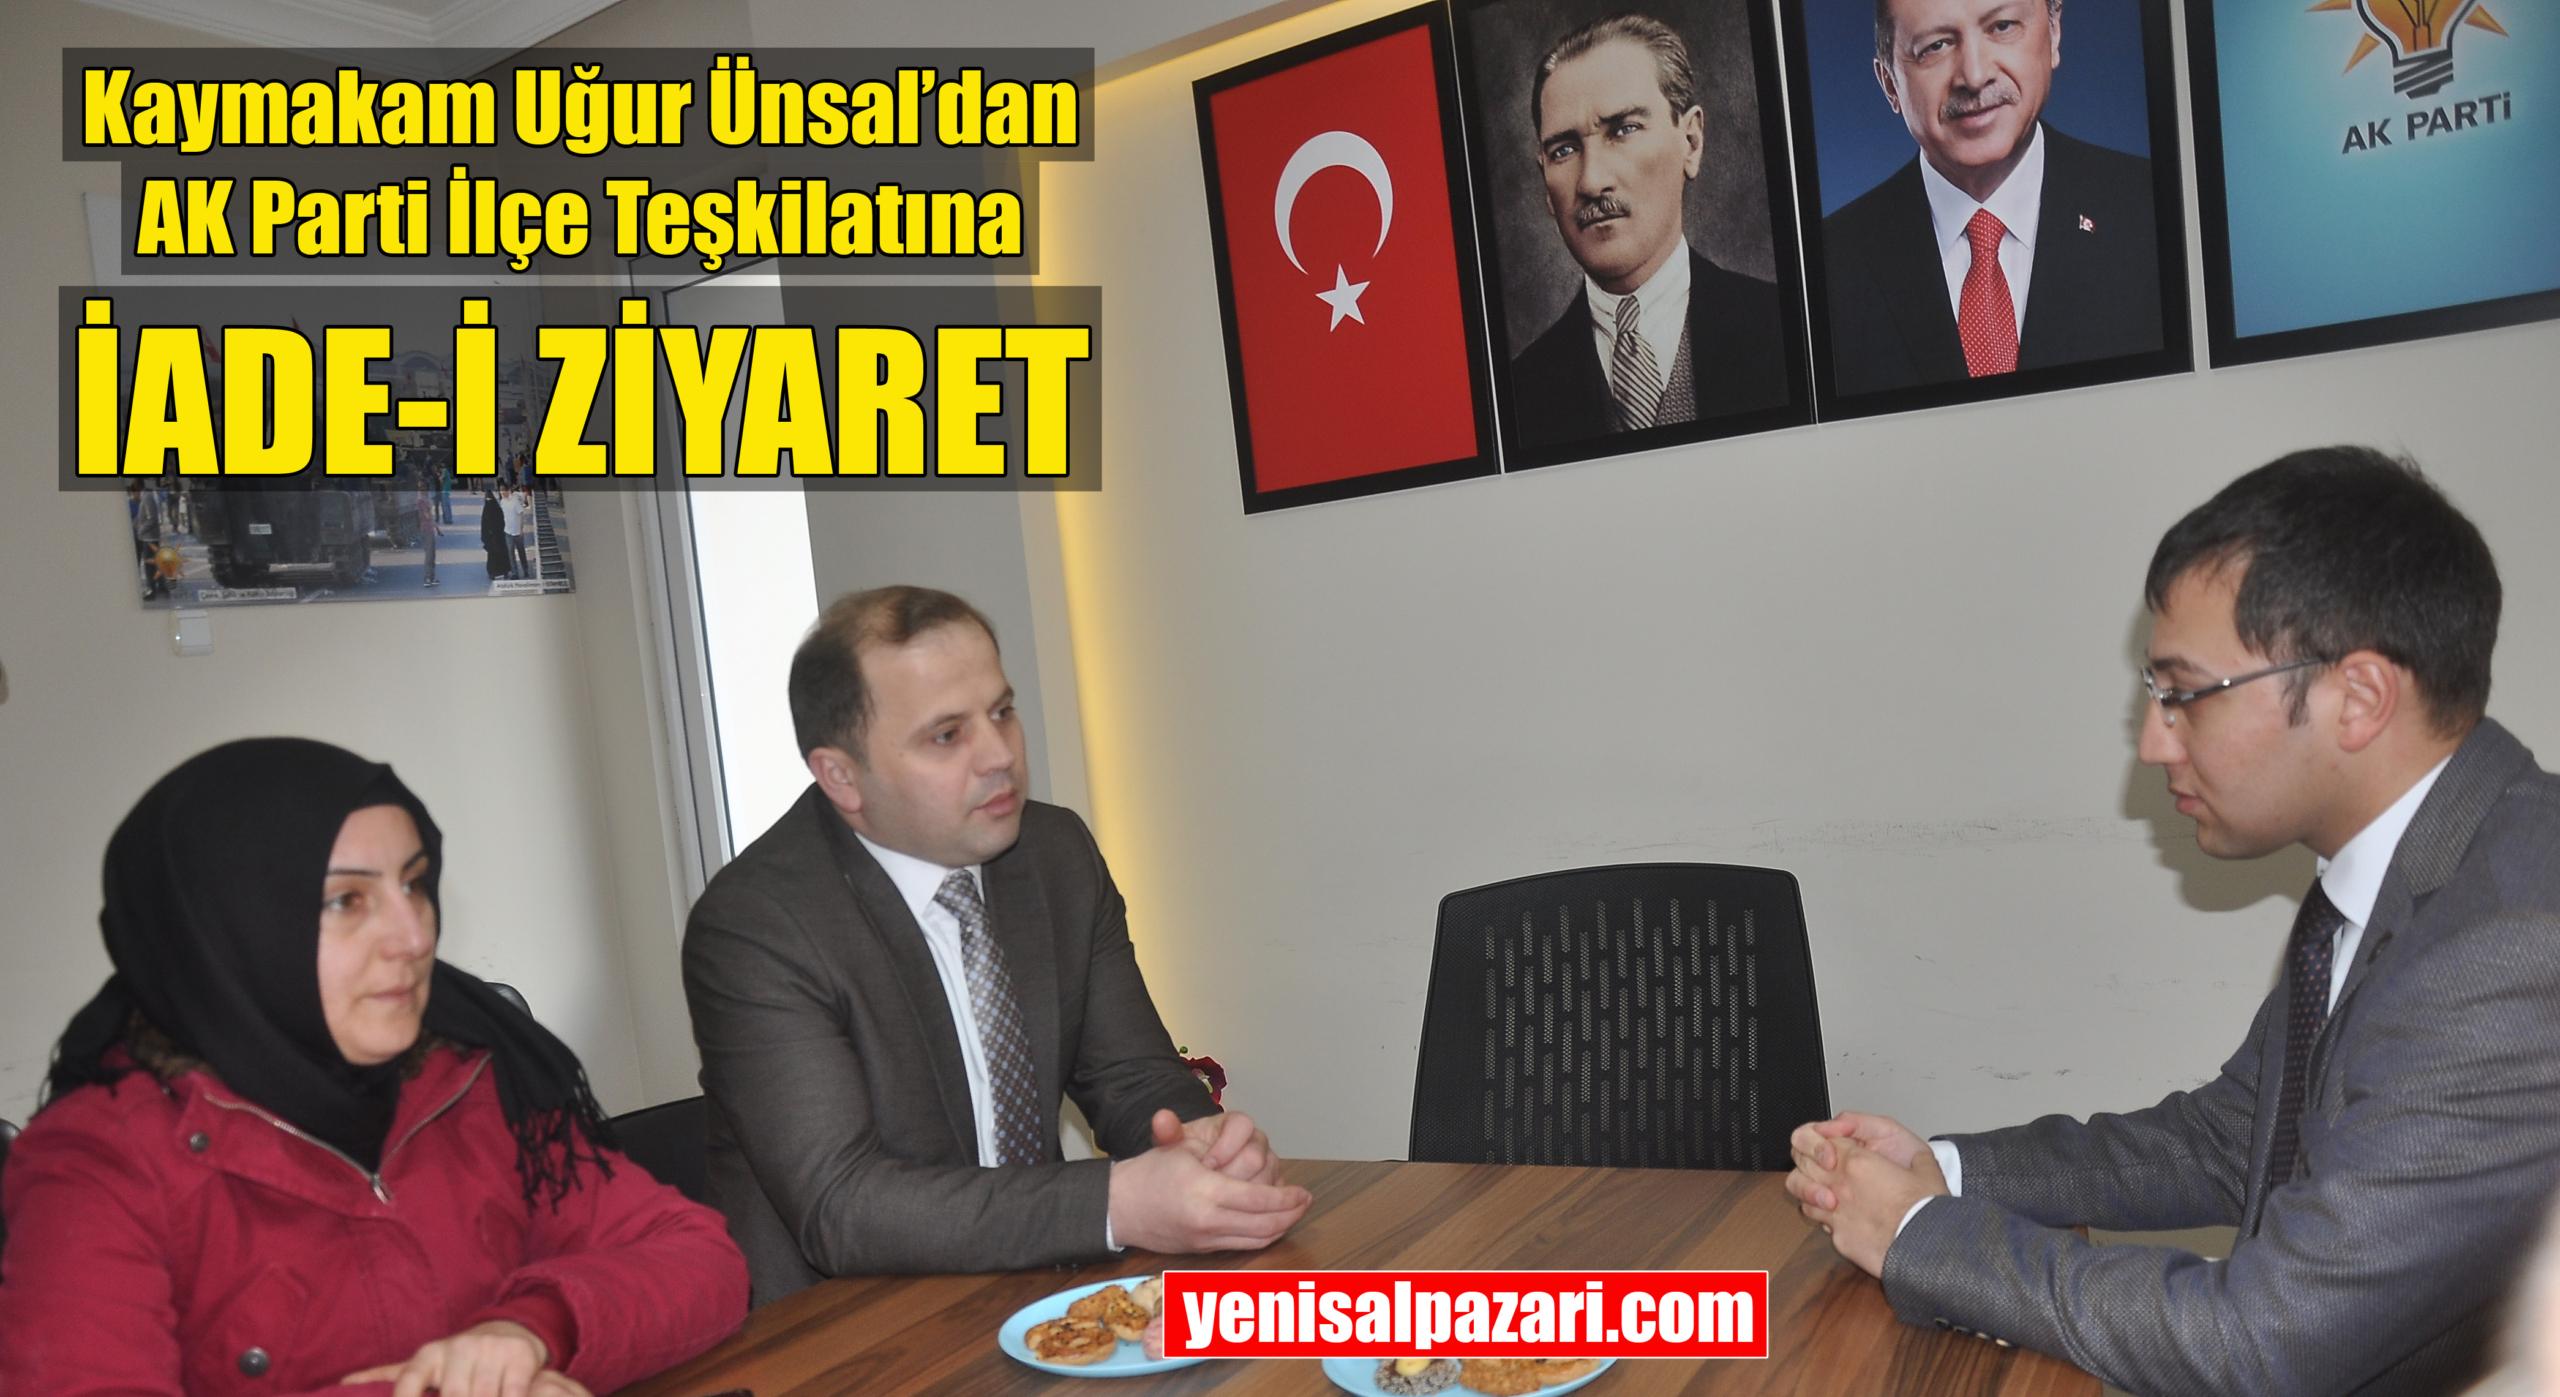 Şalpazarı Kaymakamı Uğur Ünsal AK Parti İlçe Teşkilatını ziyaret etti